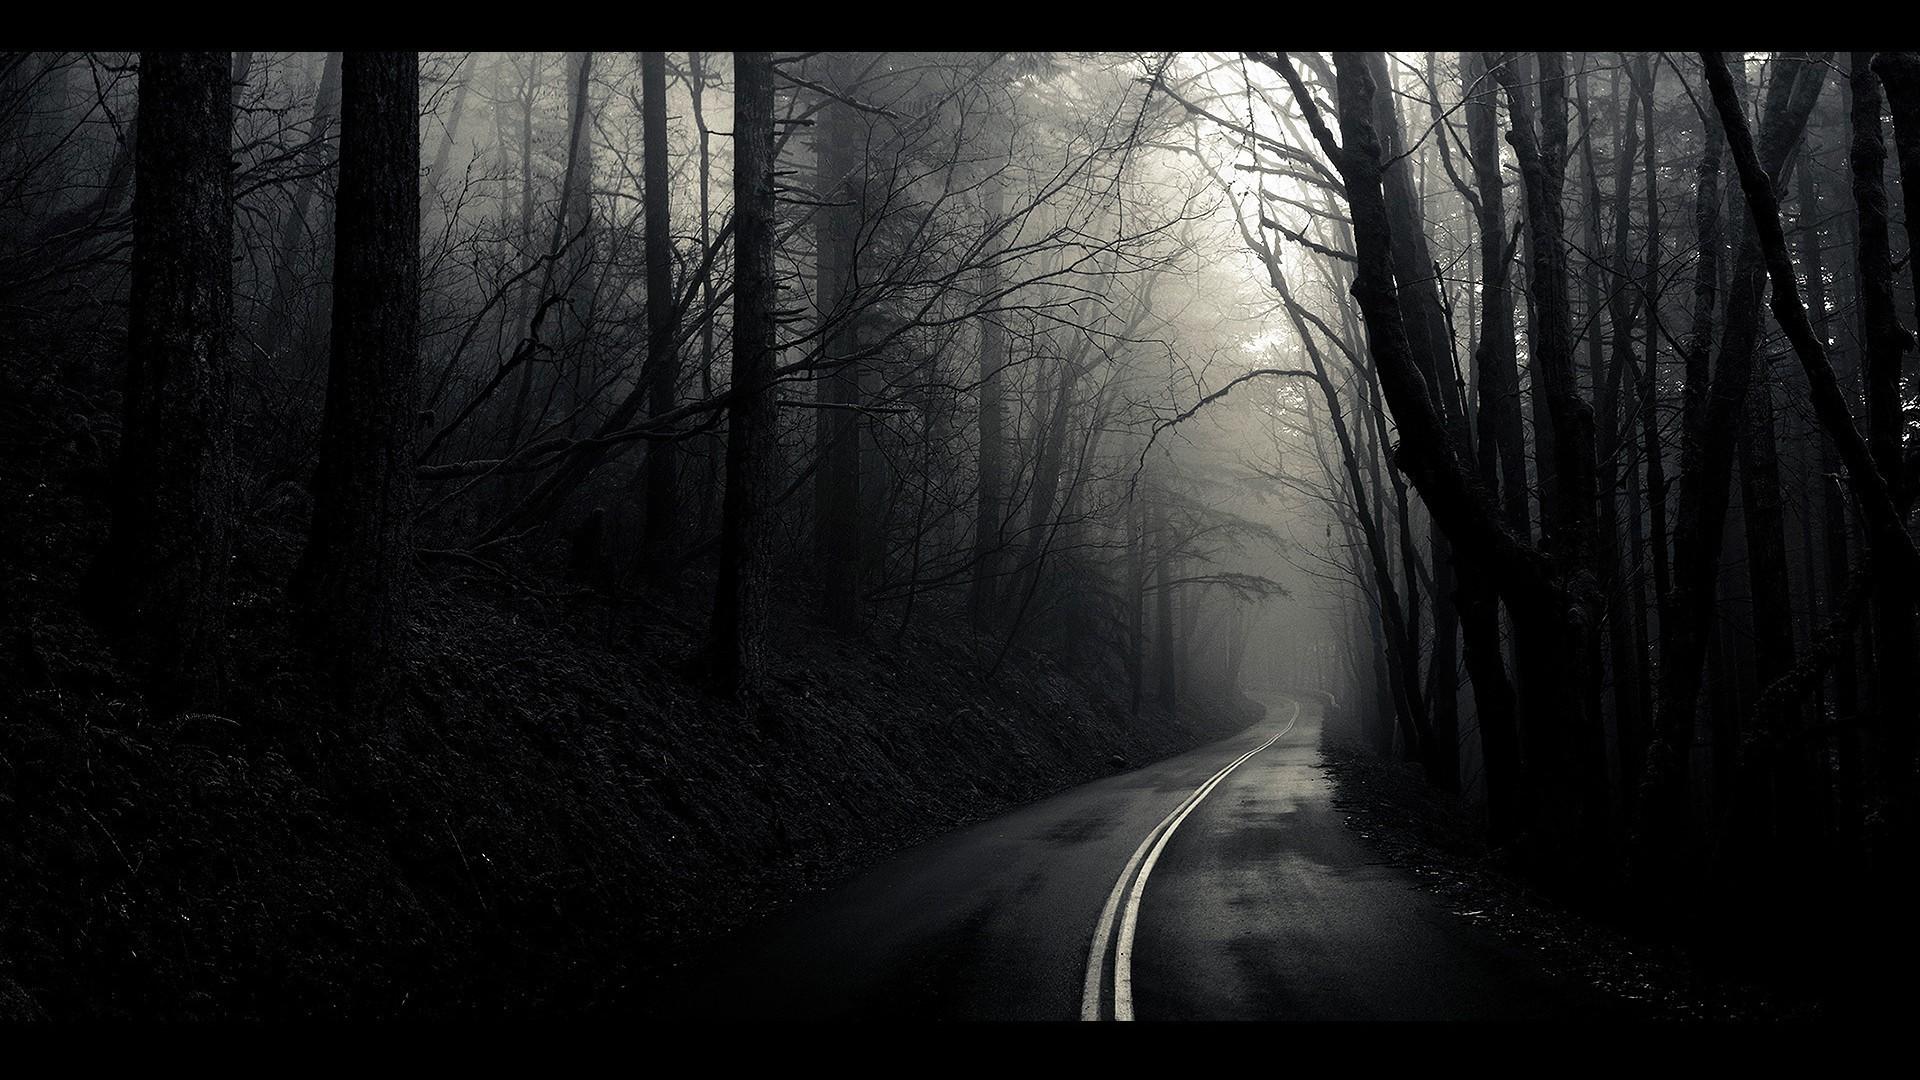 Monochrome Tag – Roads Monochrome Path Landscapes Mist Fog White Black  Trees Beautiful Nature Hd Desktop